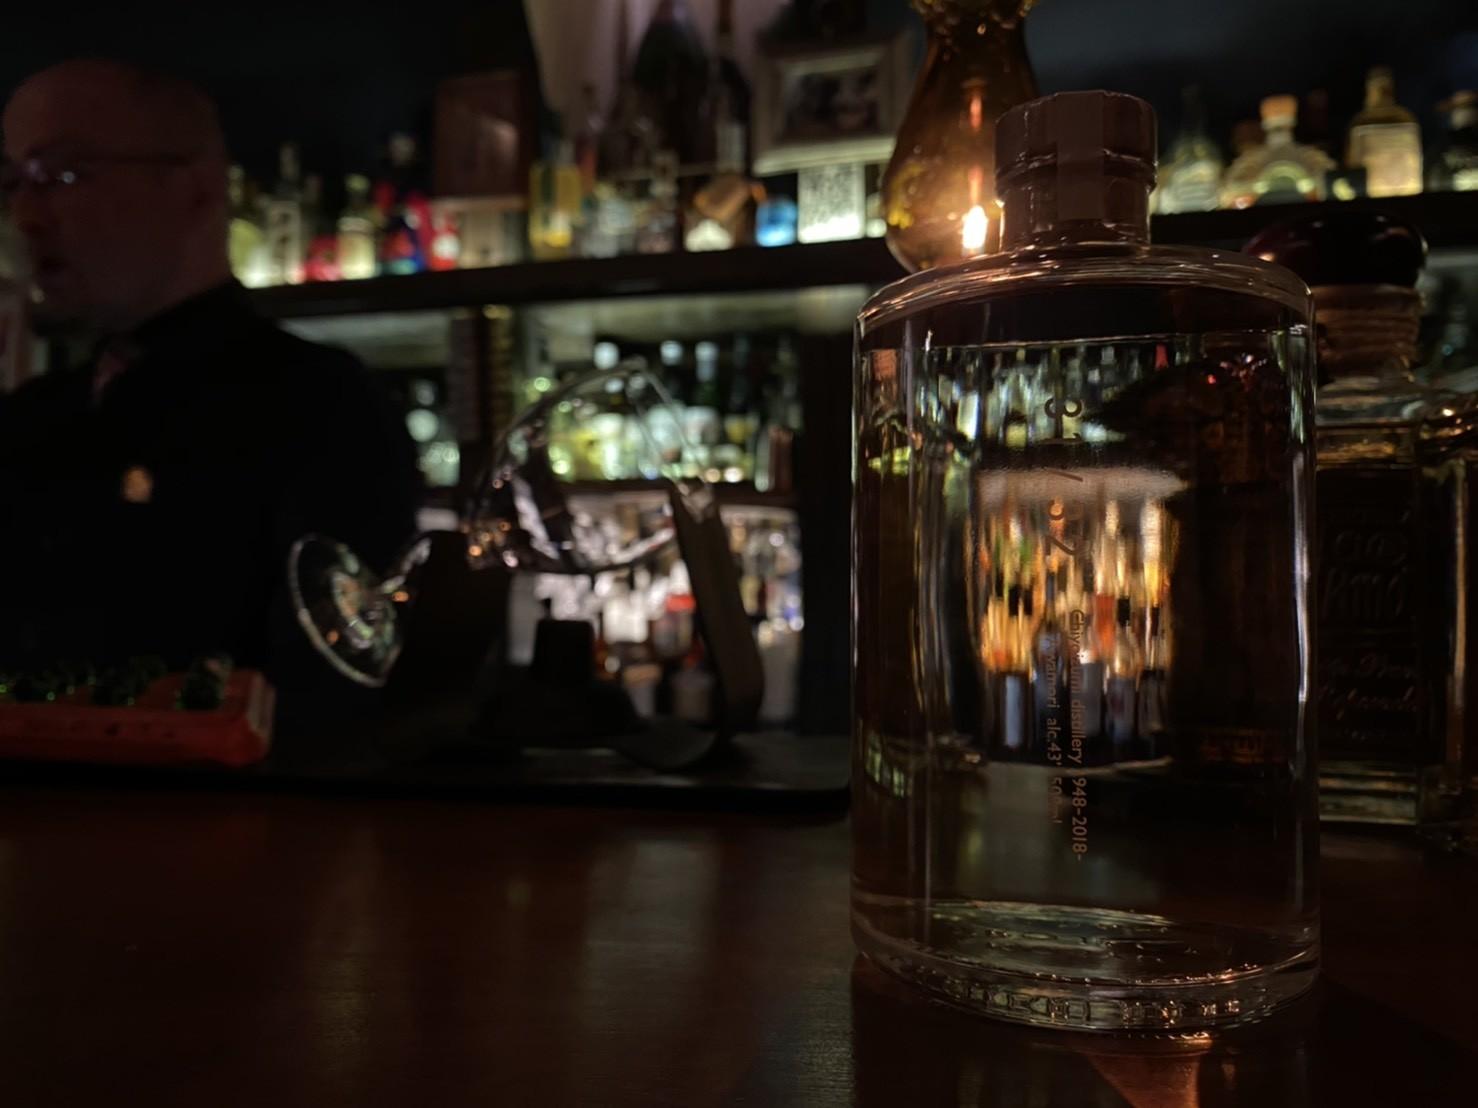 31/32Chiyoizumiが飲める空間 Bar Gracias DAY.001